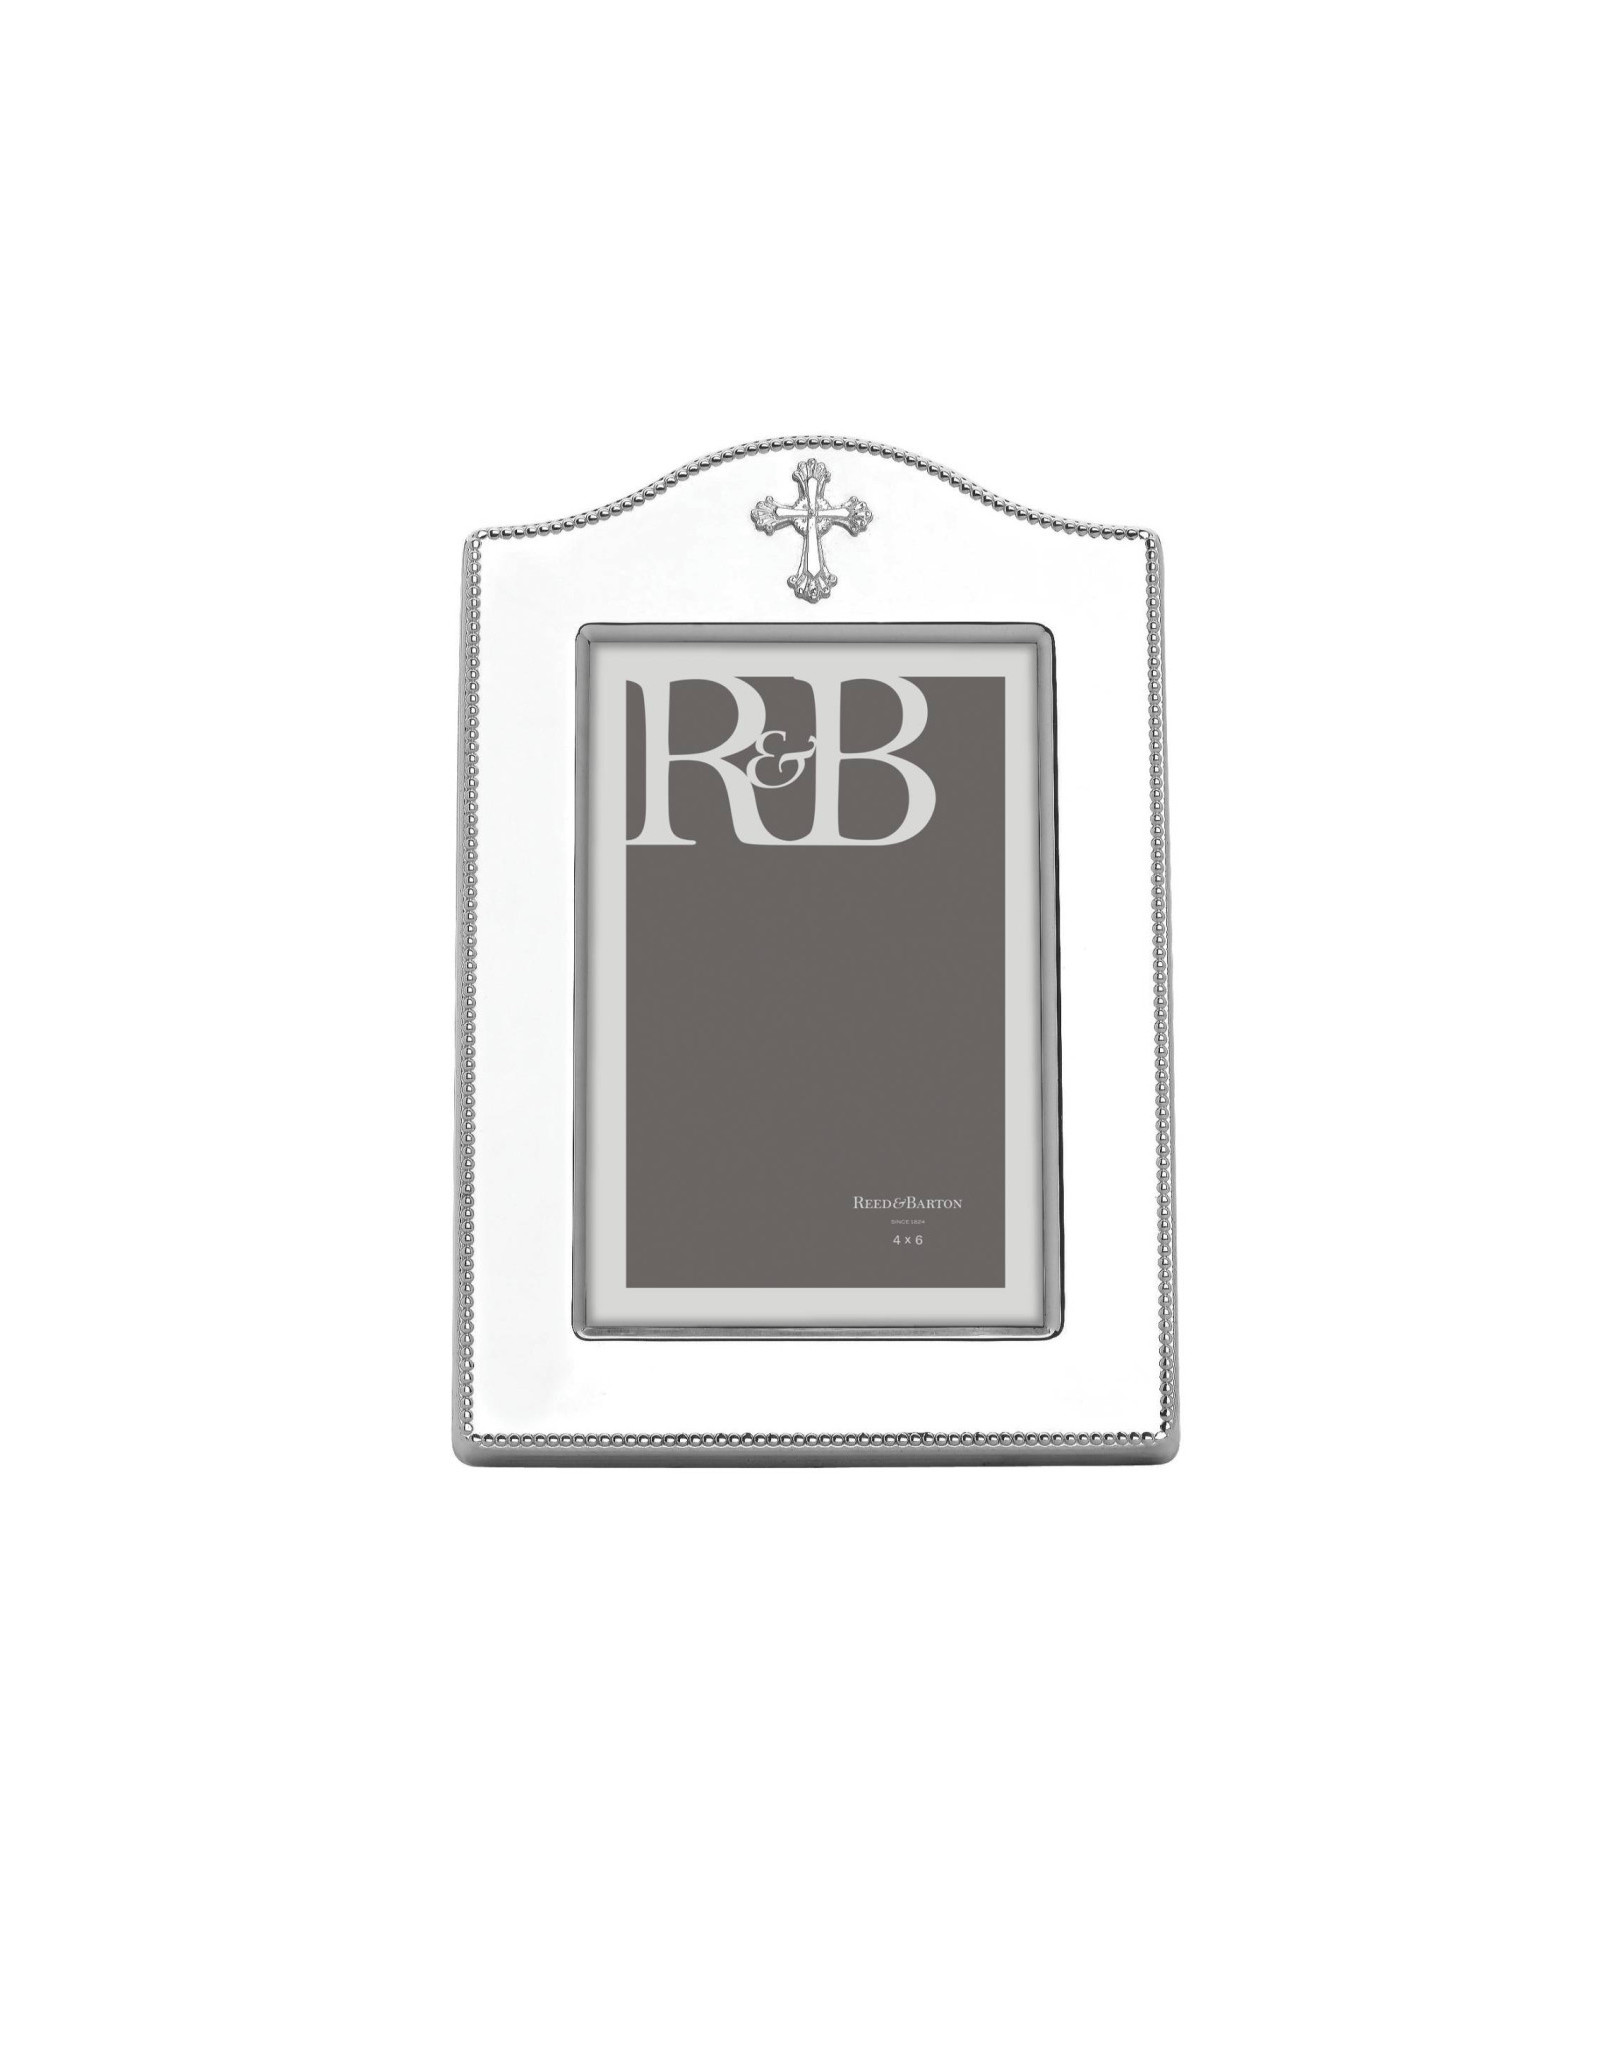 Reed & Barton Abbey Frame 4x6